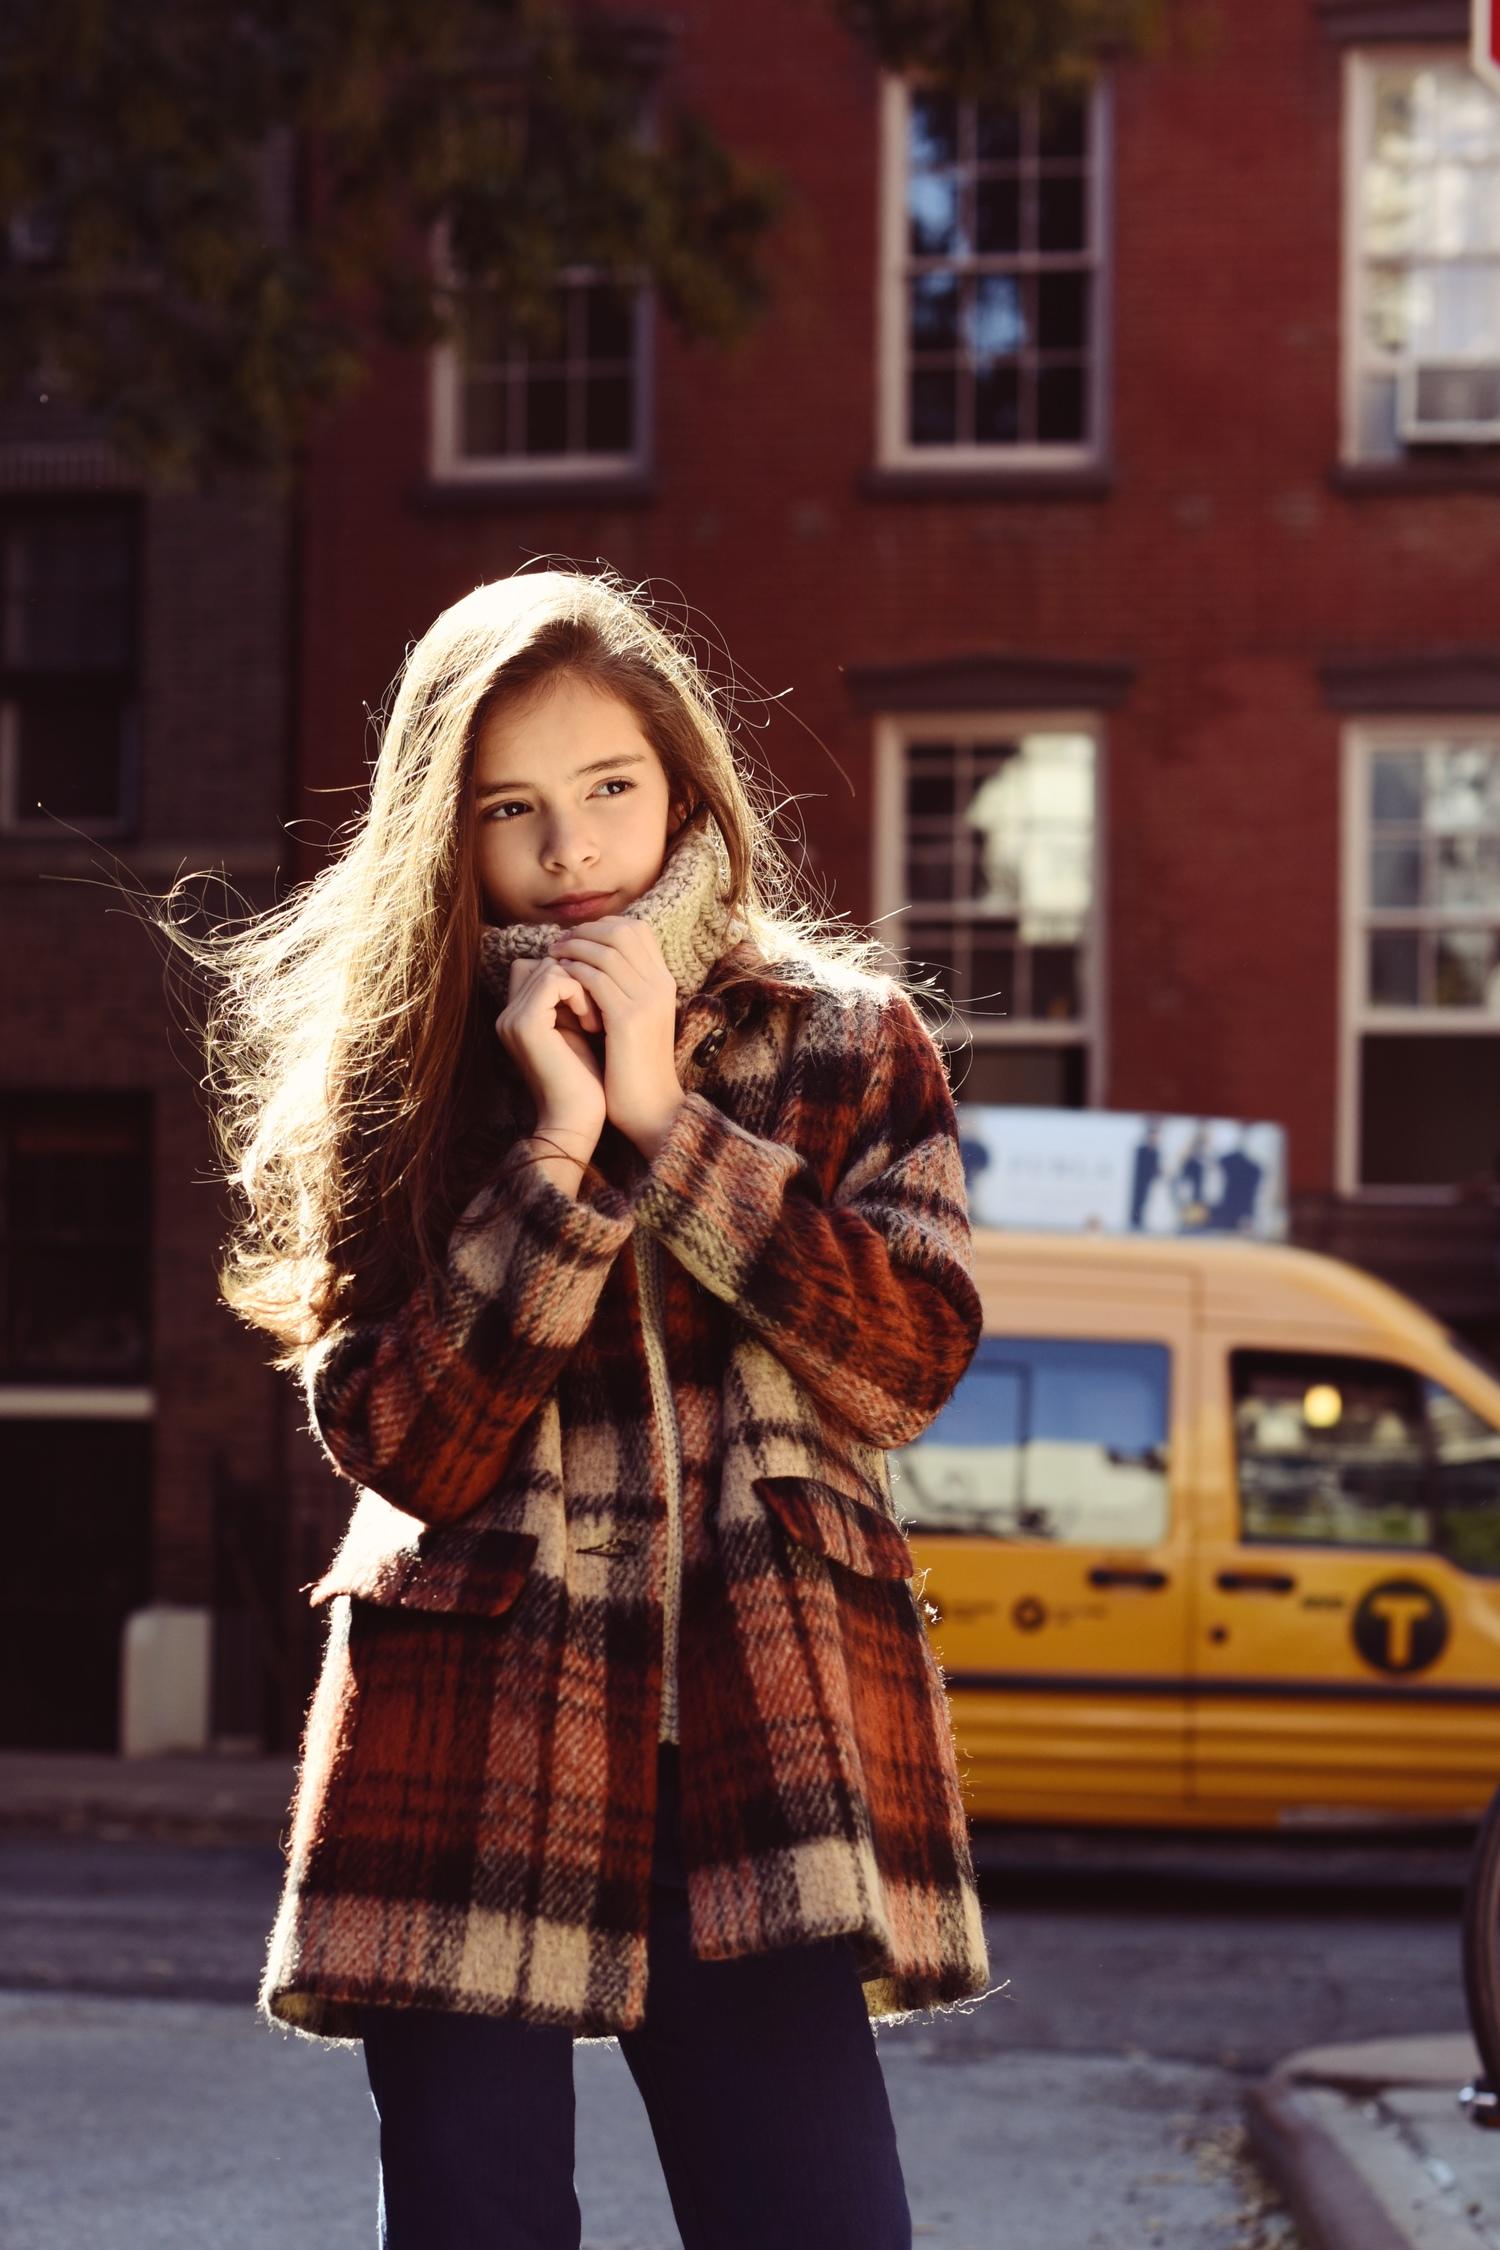 Enfant+Street+Style+by+Gina+Kim+Photography-17.jpeg